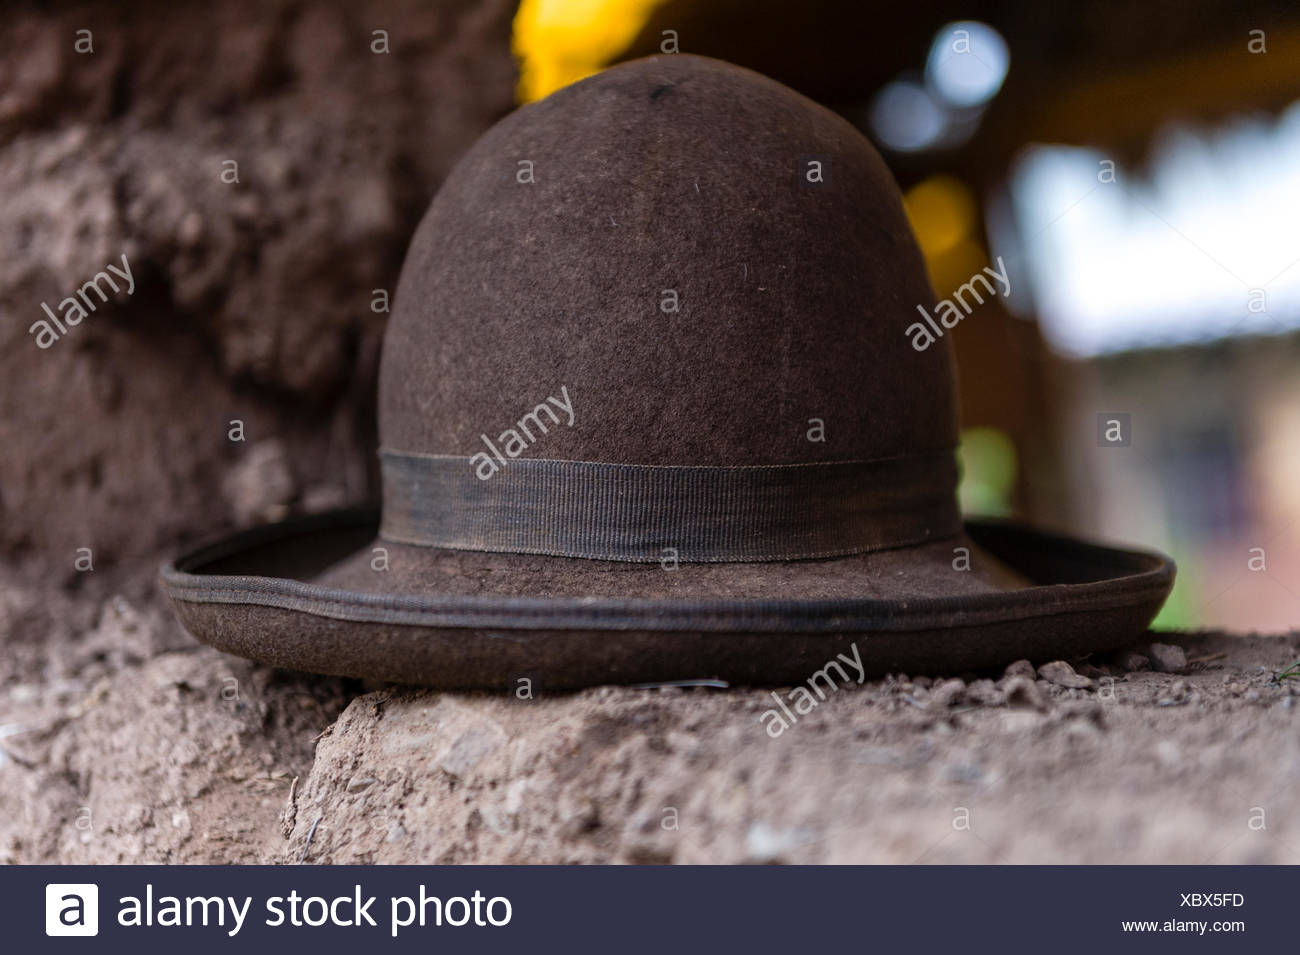 A felt Montera hat on a mud brick wall. - Stock Image